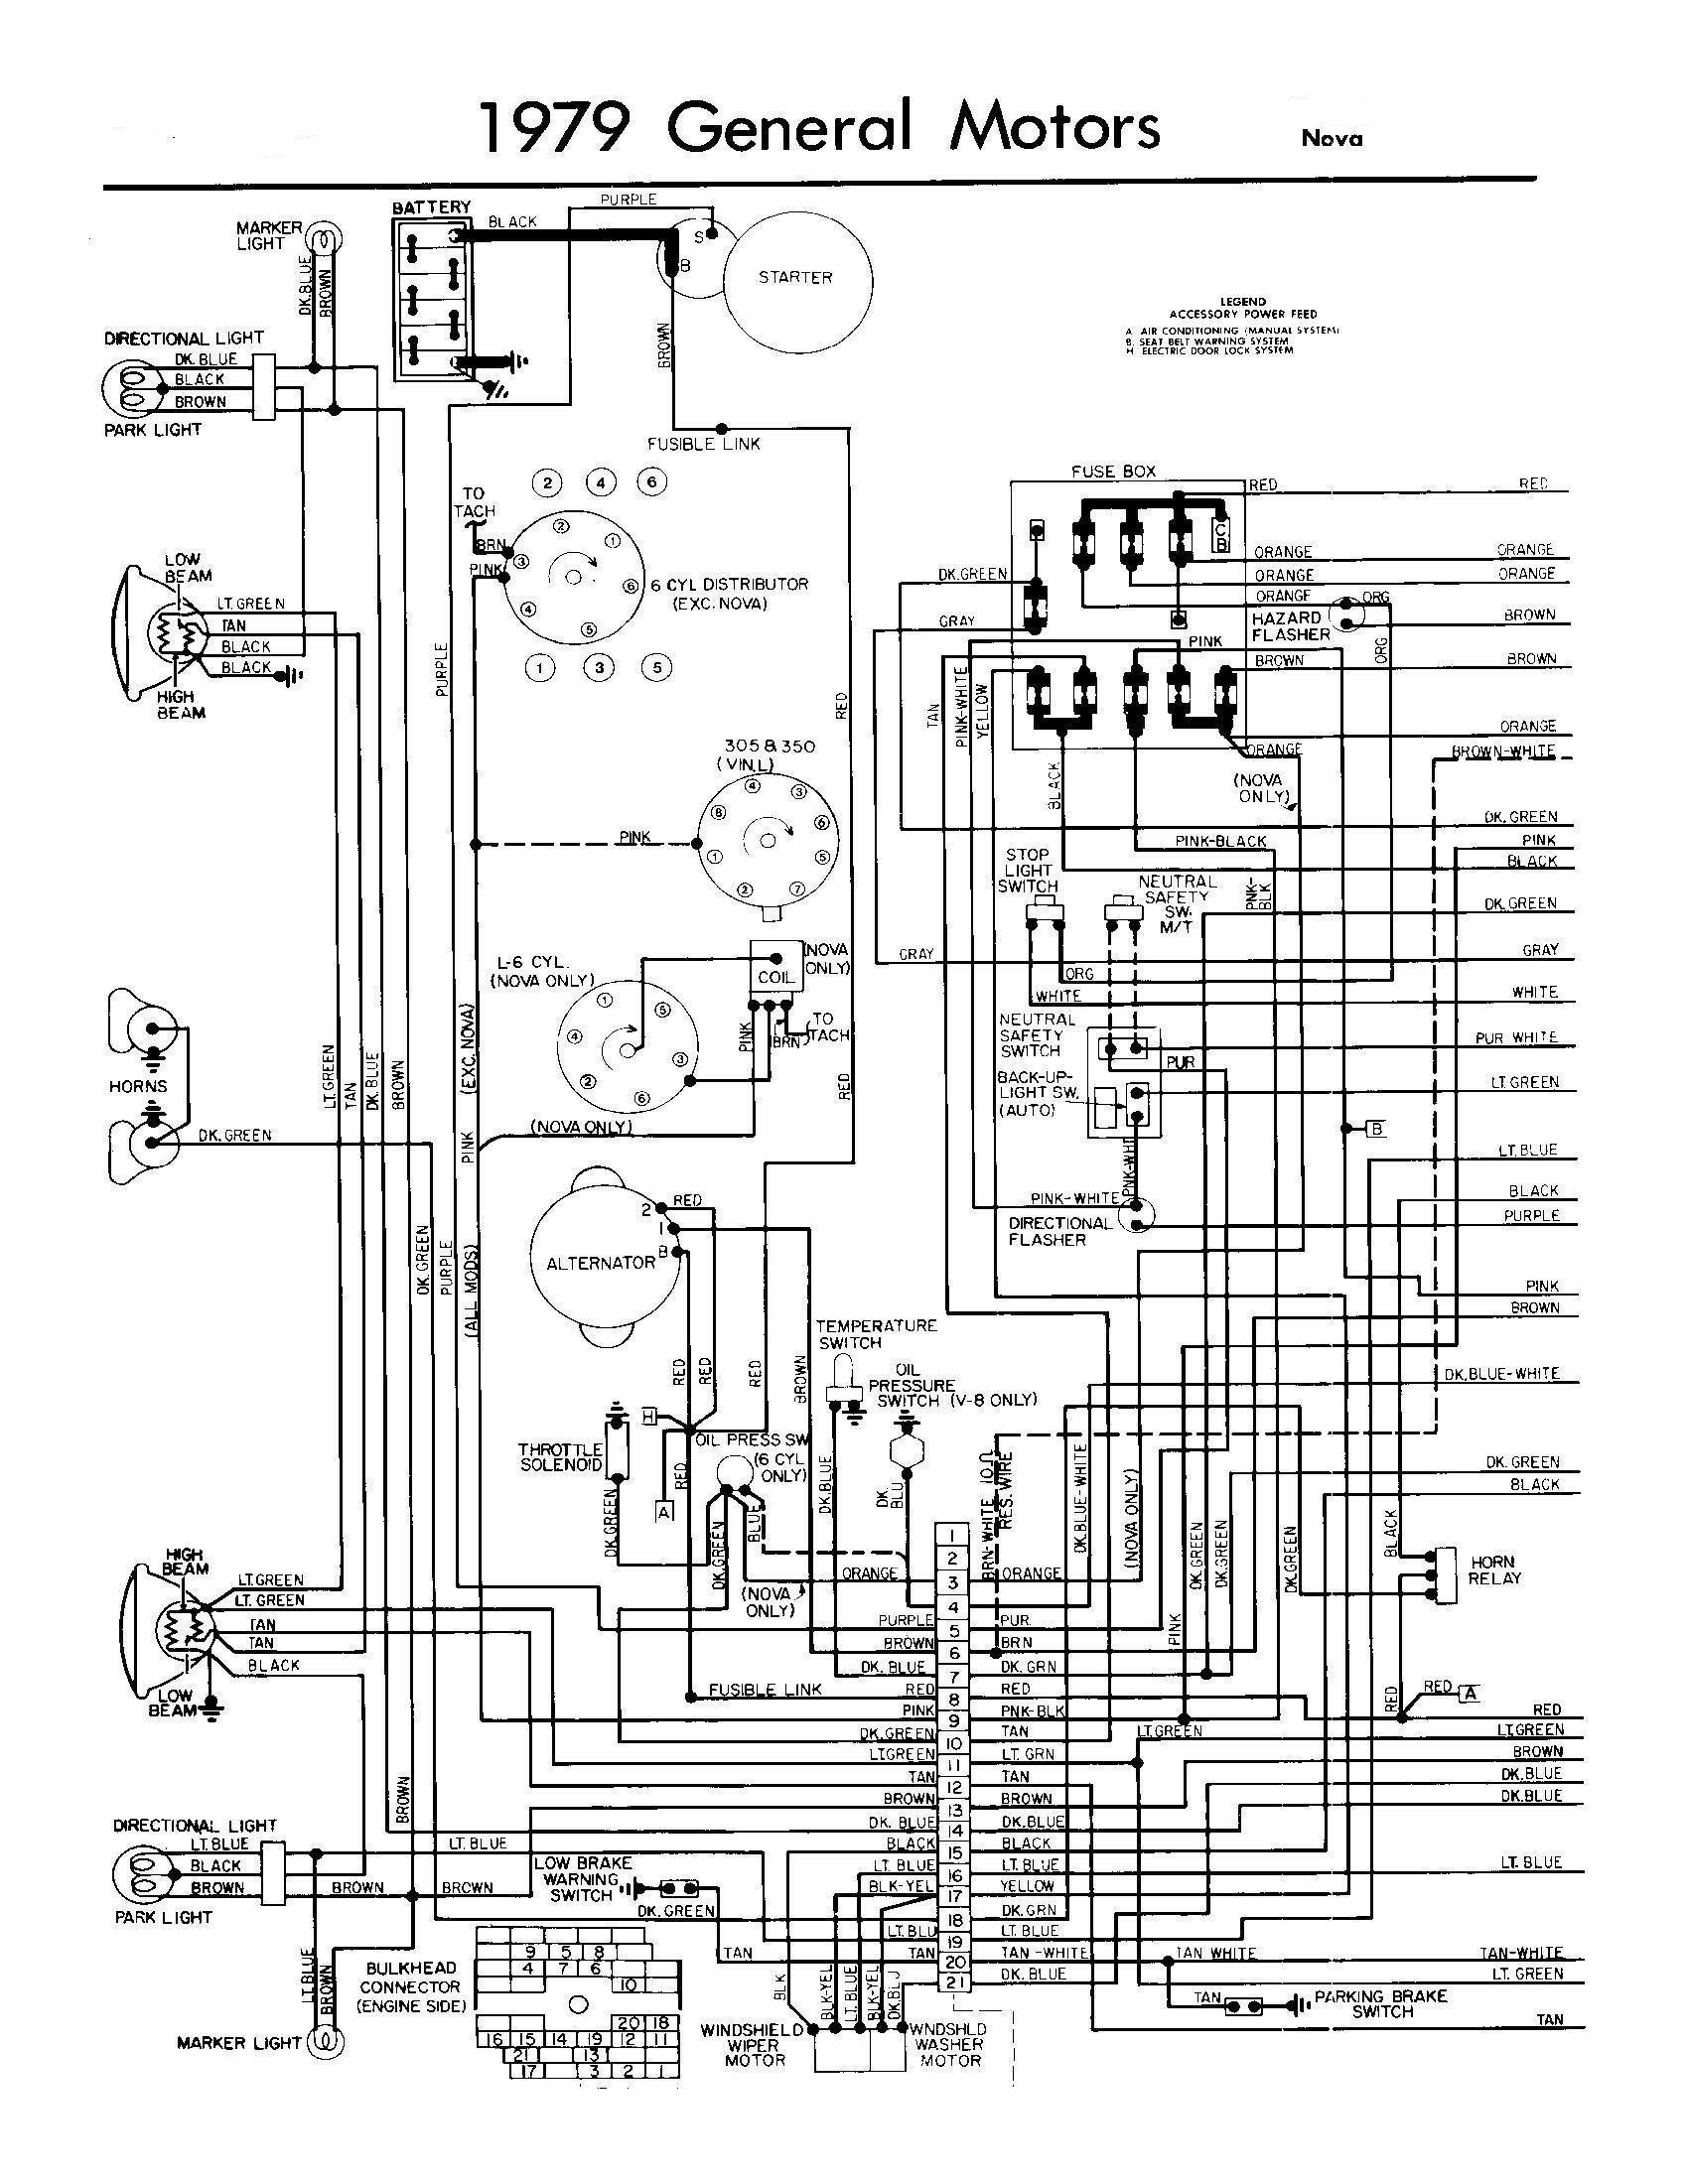 HY_1941] 1986 Toyota Pickup Wiring Diagram 1993 Toyota Pickup Truck WiringInrebe Hyedi Mohammedshrine Librar Wiring 101